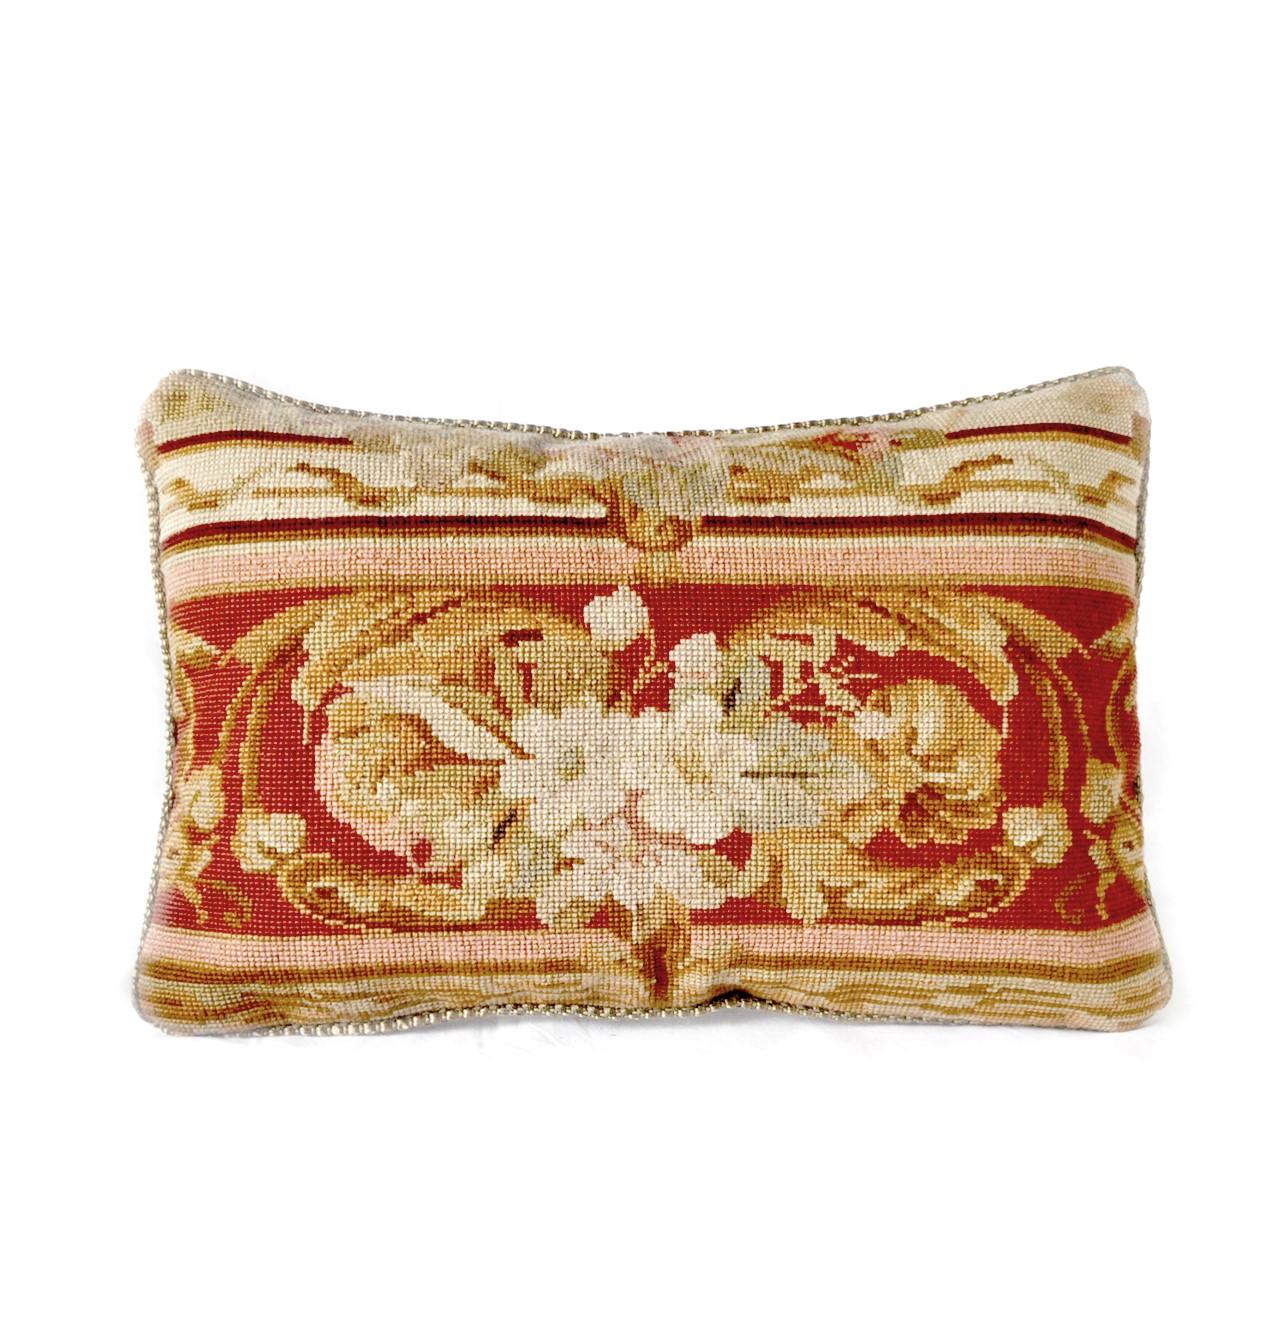 12″x18″ Handmade Wool Needlepoint Cushion Cover Pillow Case 12980892